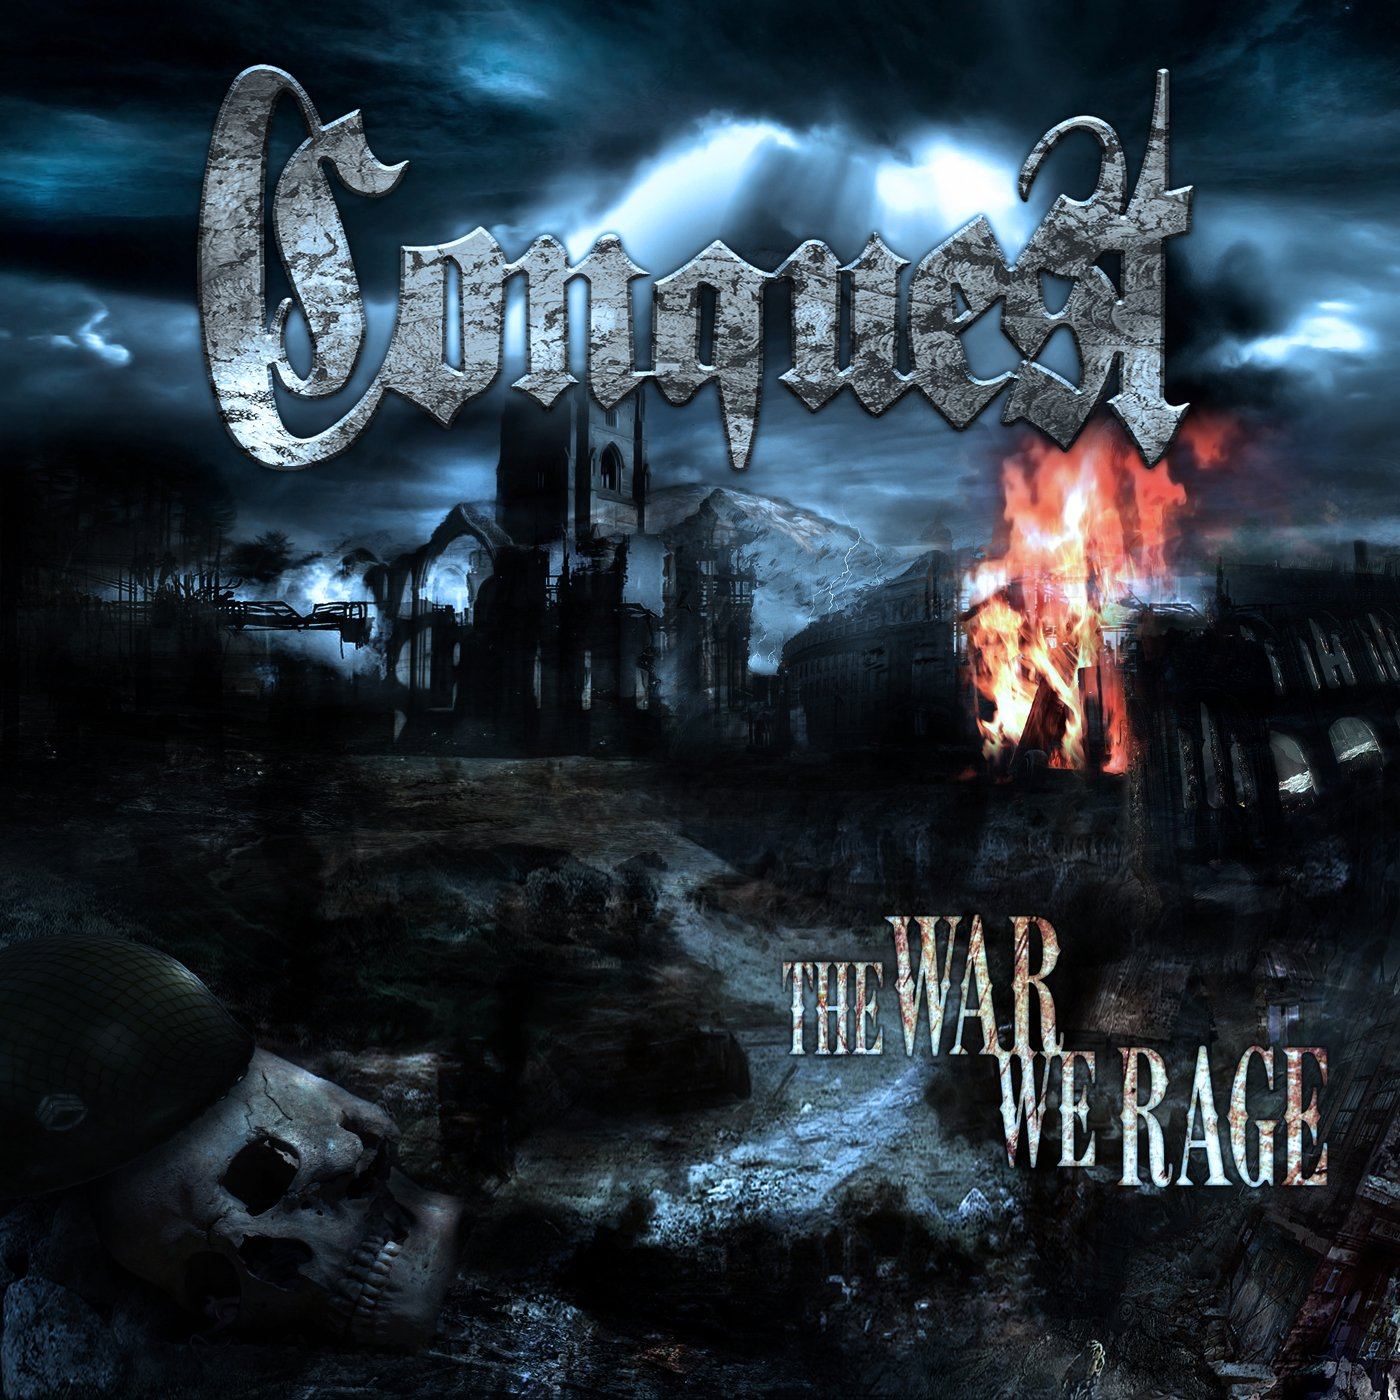 The War We Rage by Conquest + Bonus CD